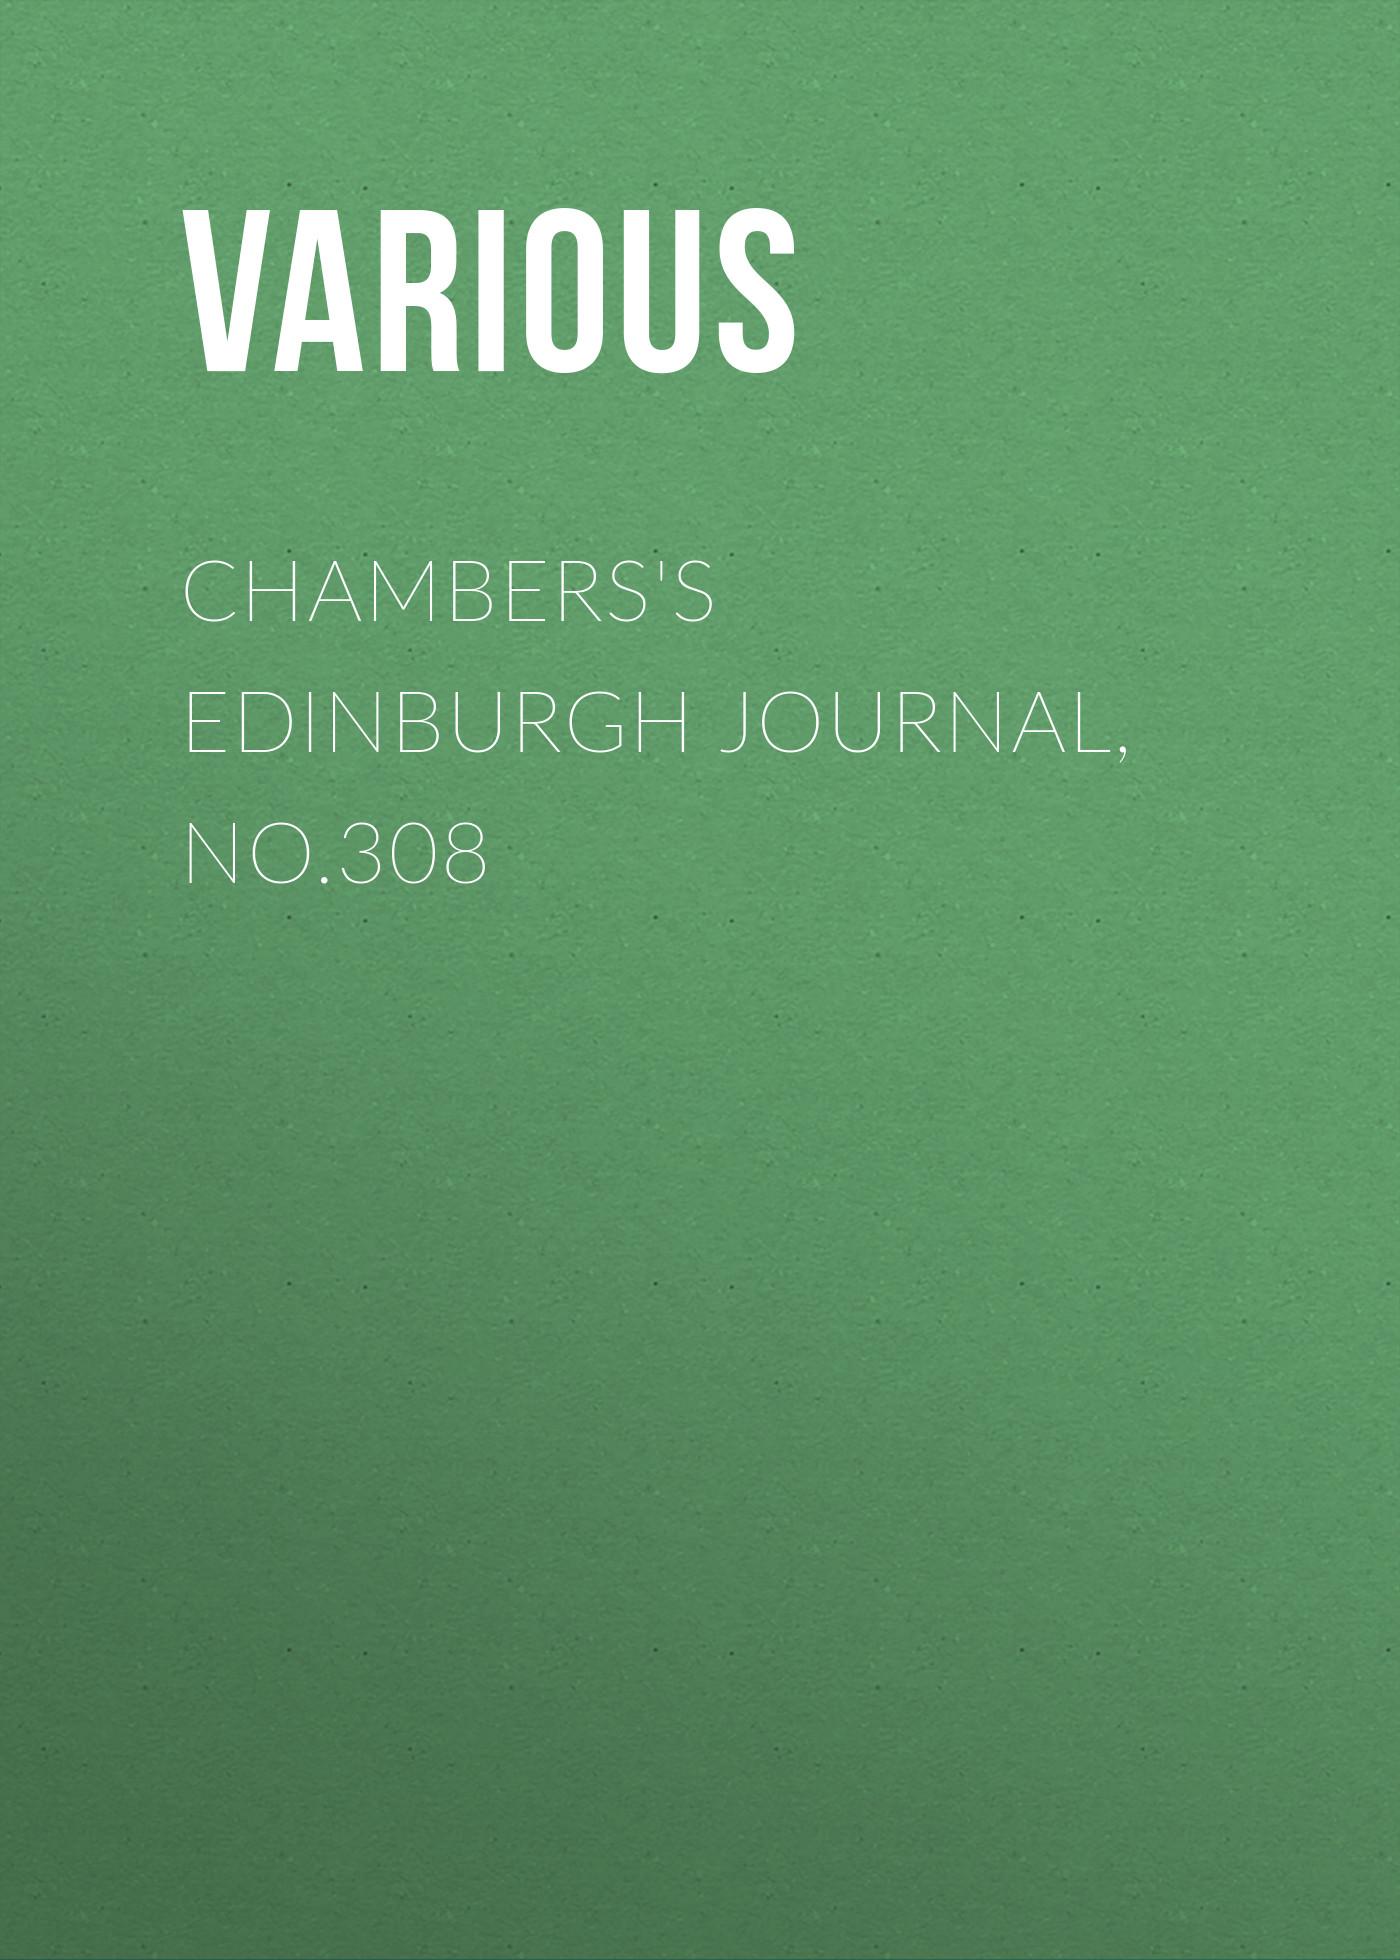 Various Chambers's Edinburgh Journal, No.308 lau edinburgh